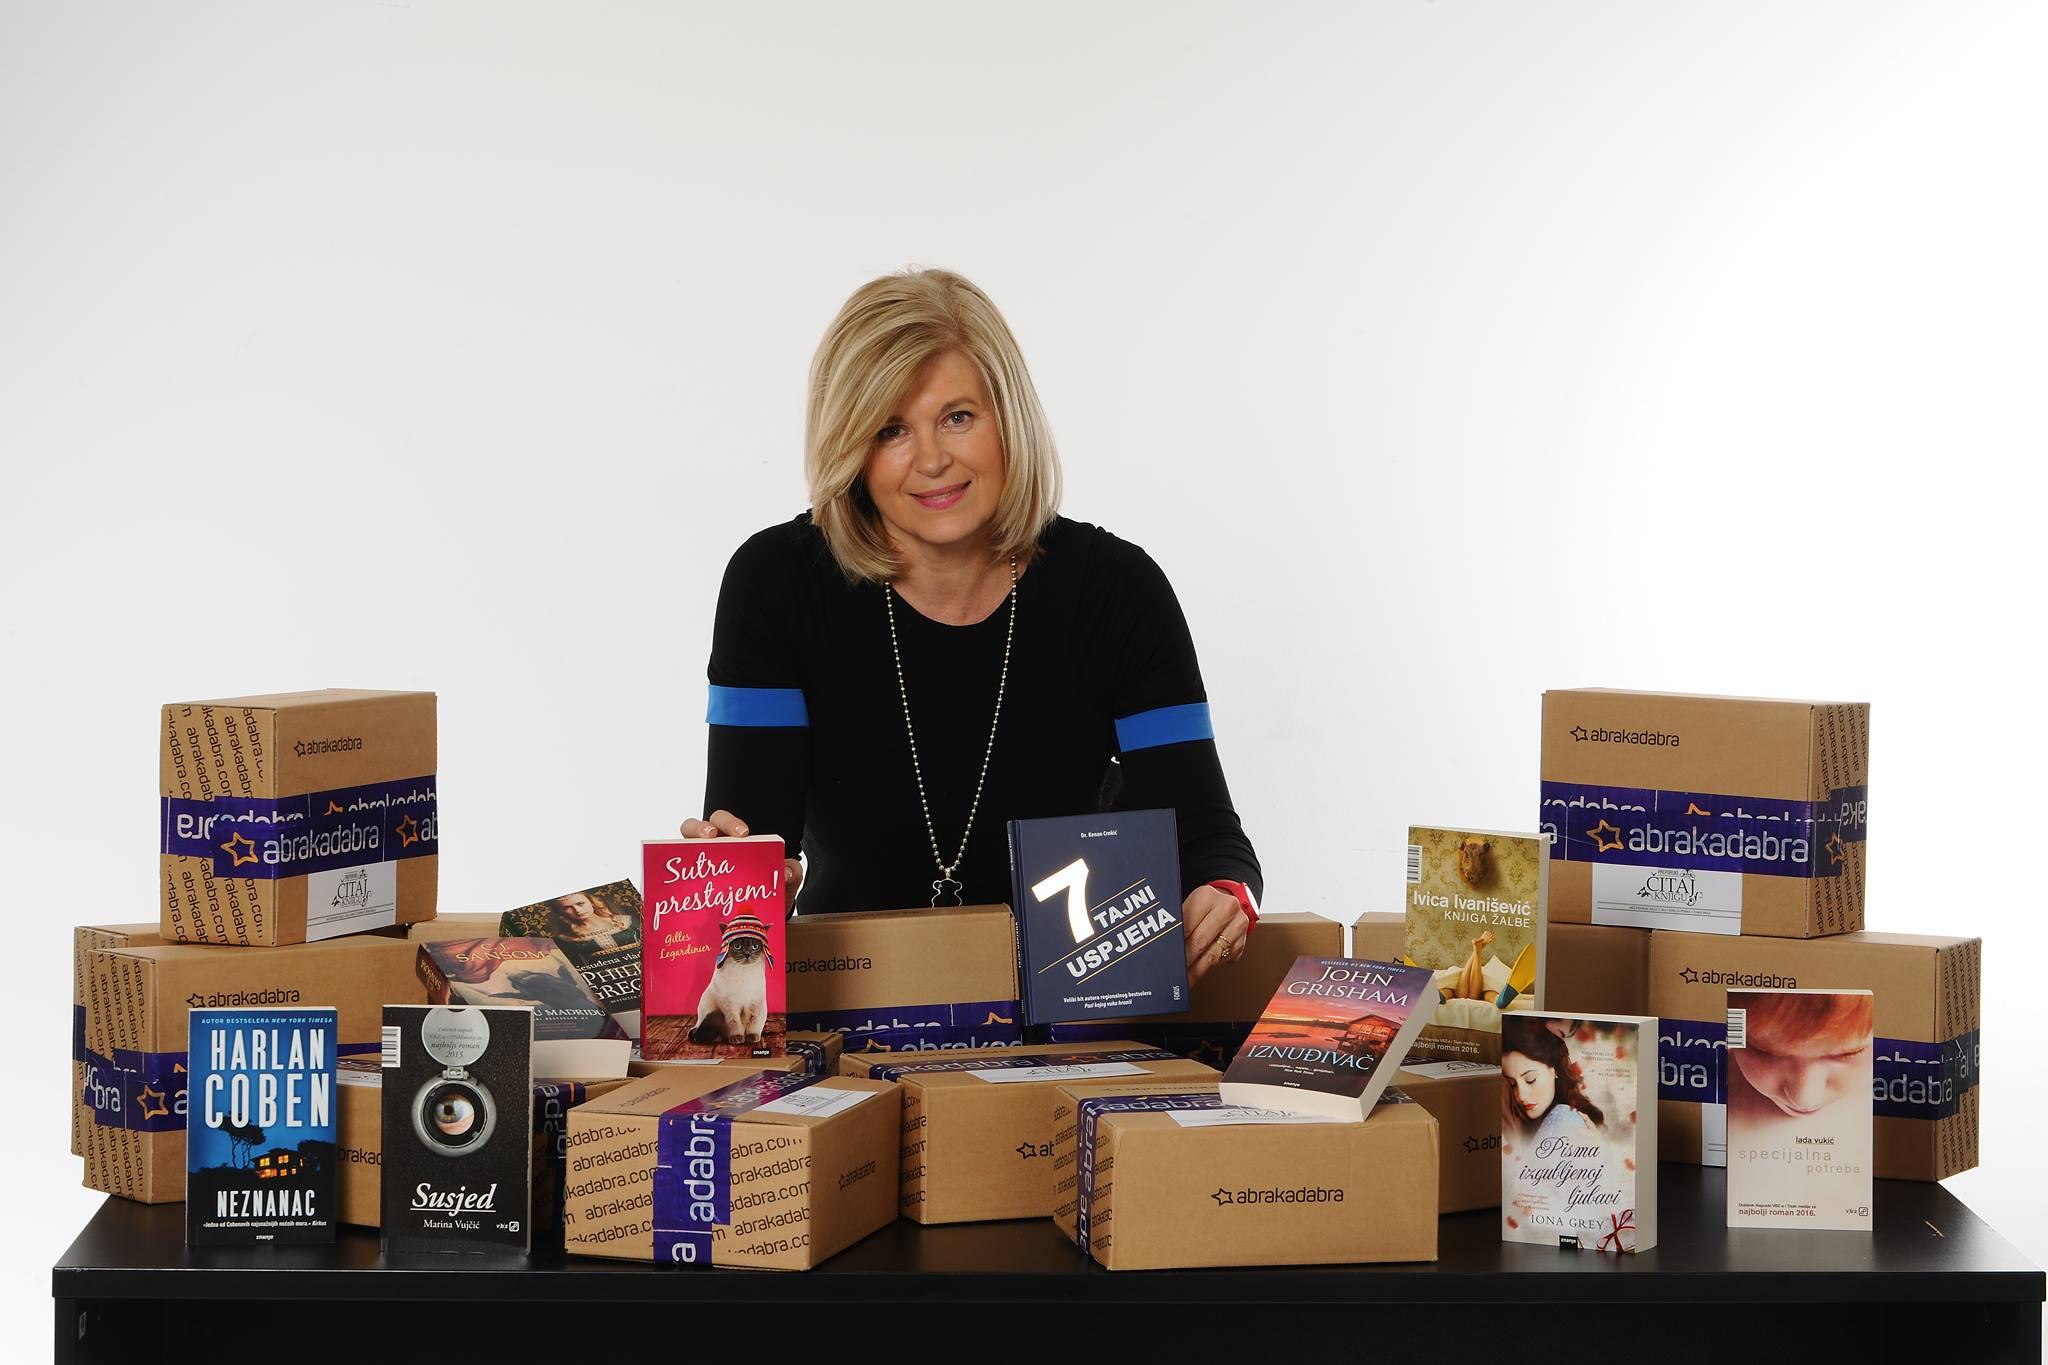 Alis: Pokrenula sam mnogobrojne projekte vezane uz knjige